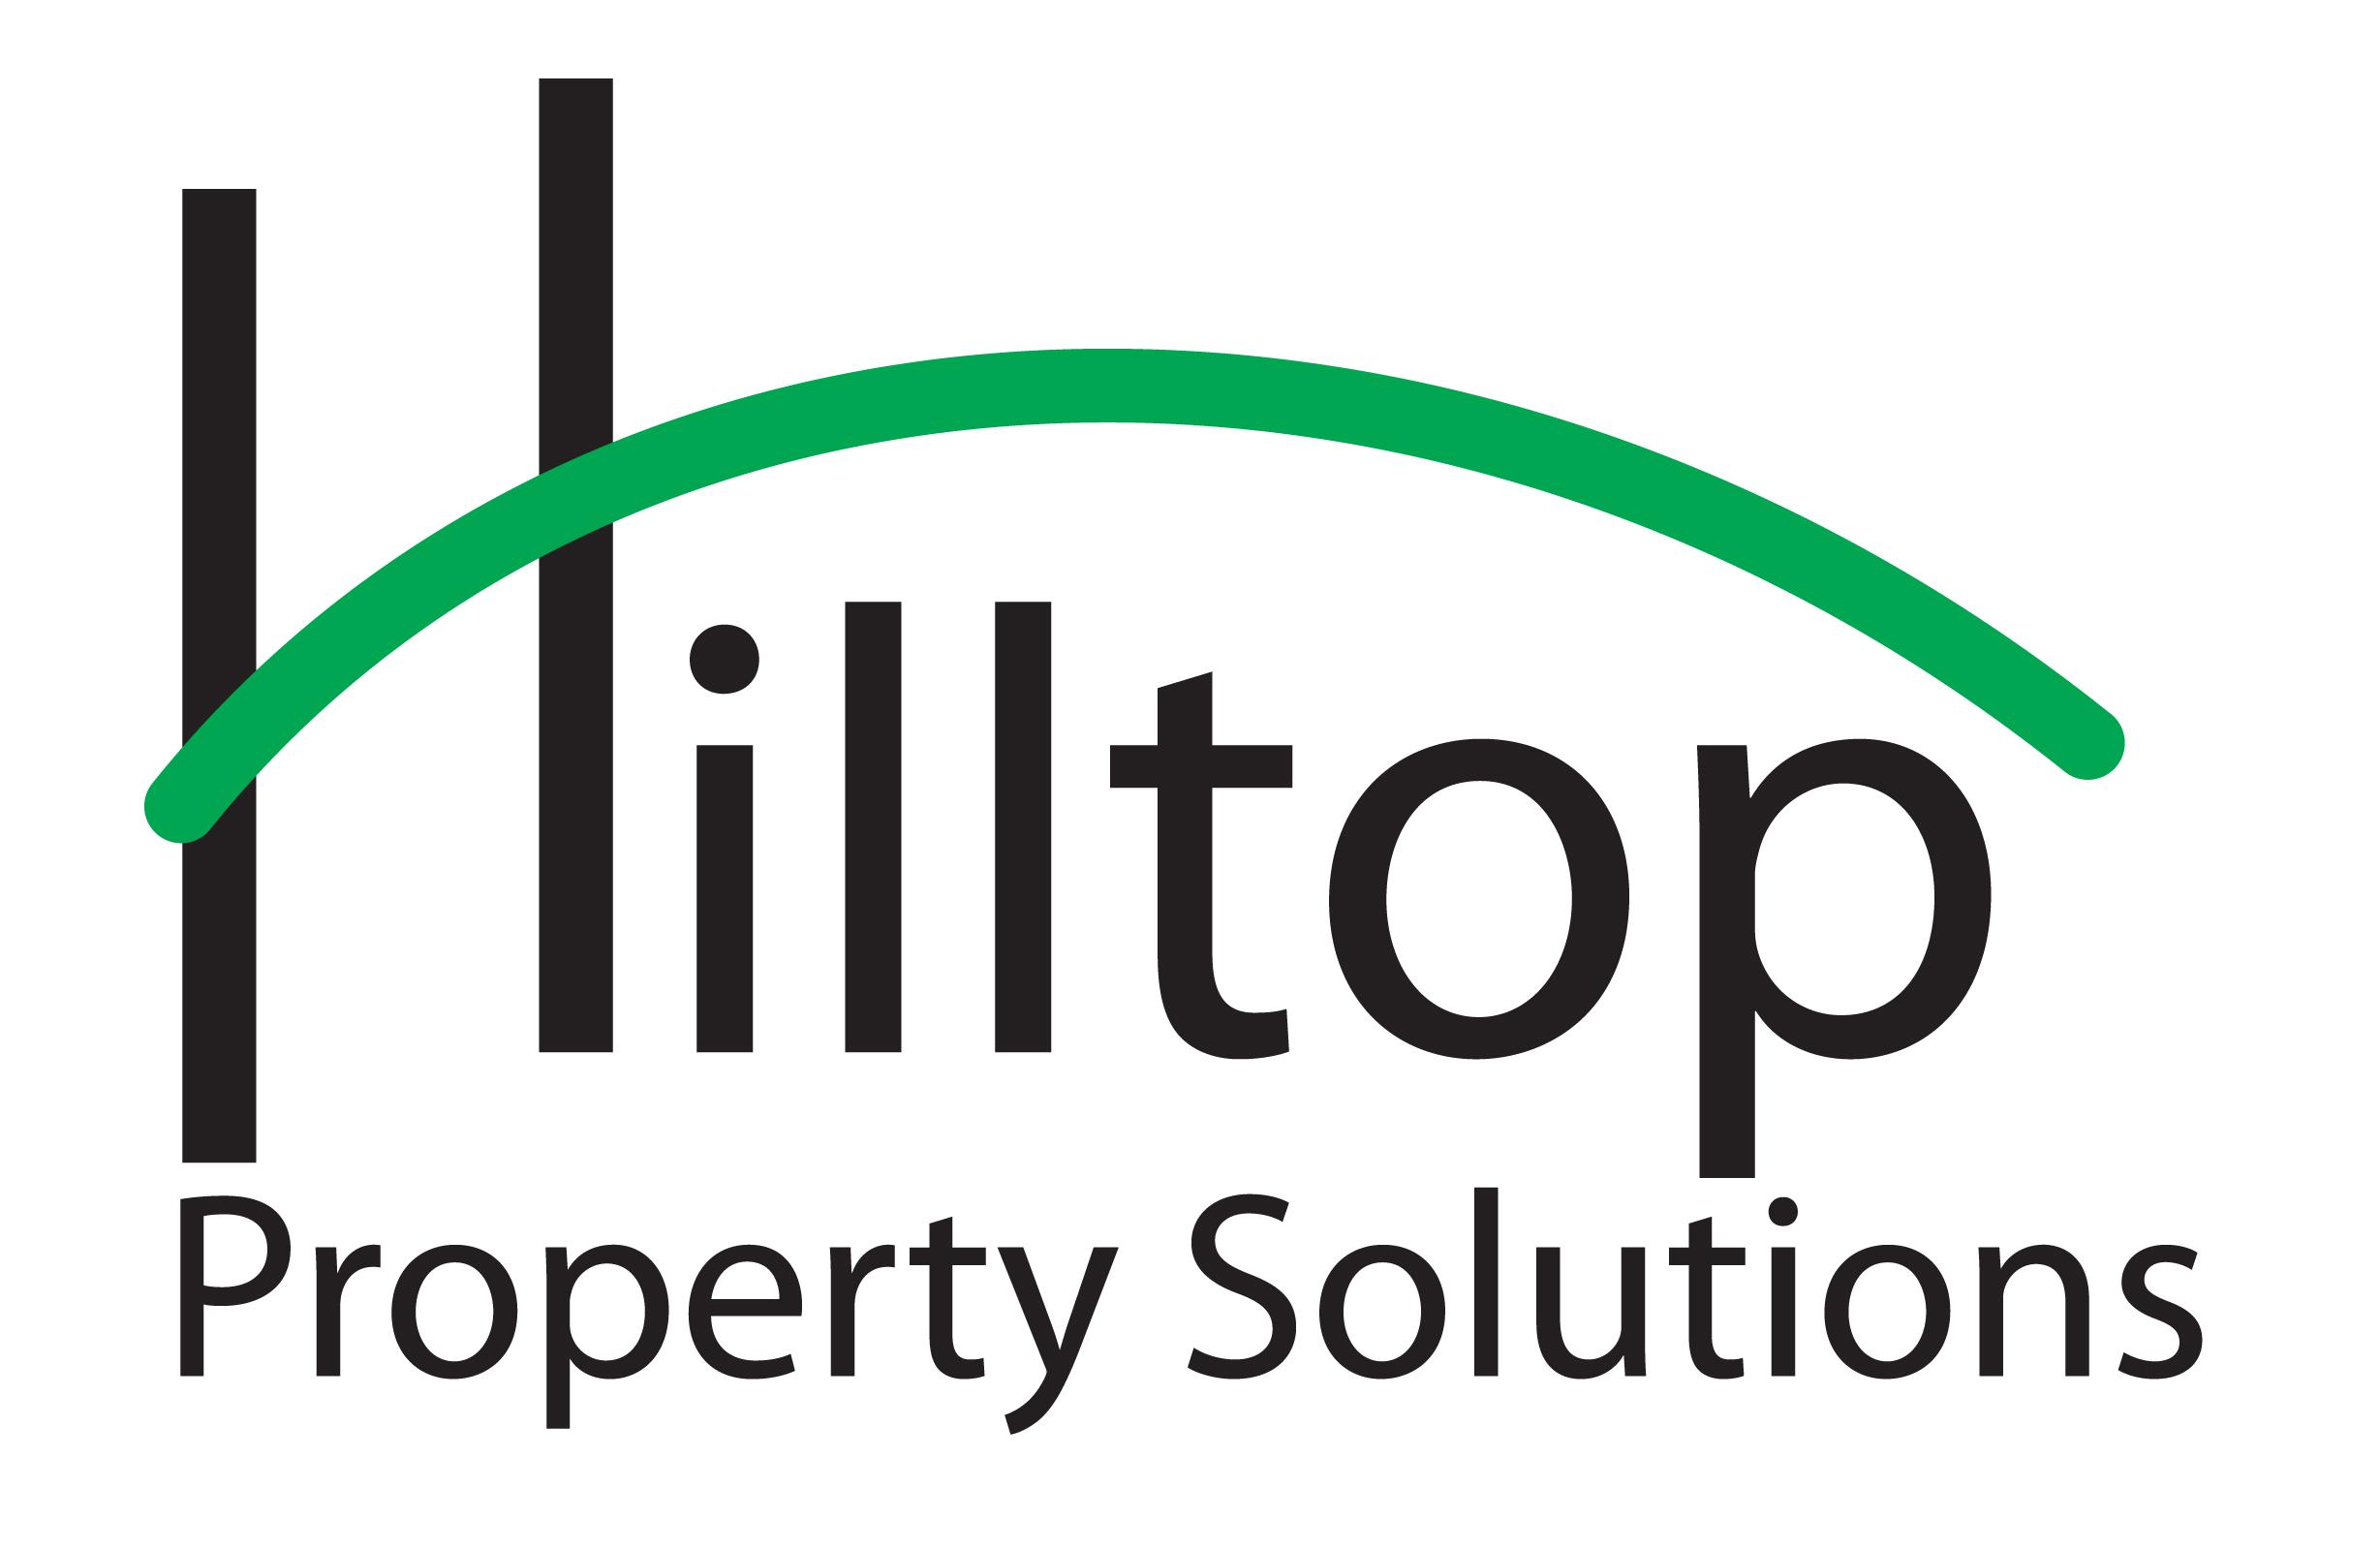 Logo Design by Greg Dimler - Entry No. 8 in the Logo Design Contest Imaginative Logo Design for Hilltop Property Solutions.